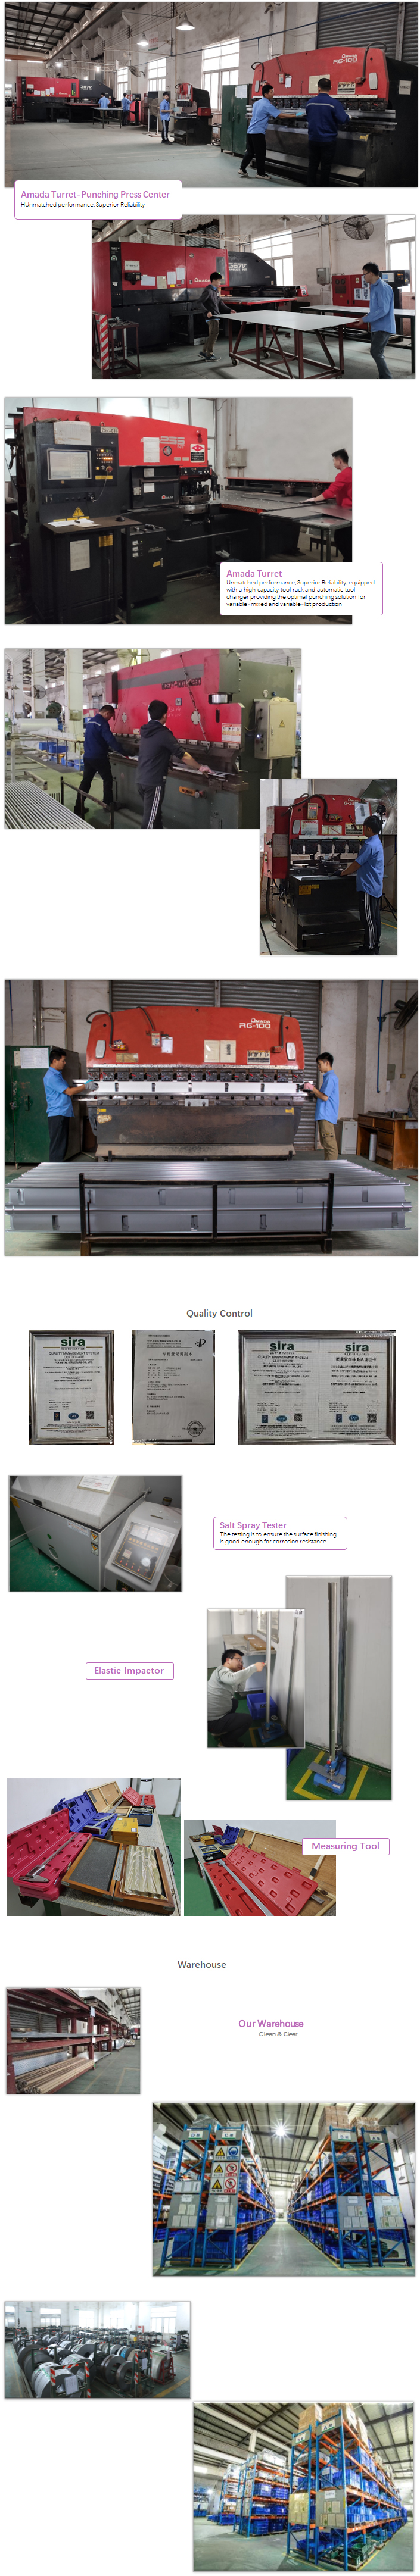 Telecom system in sheet metal housing